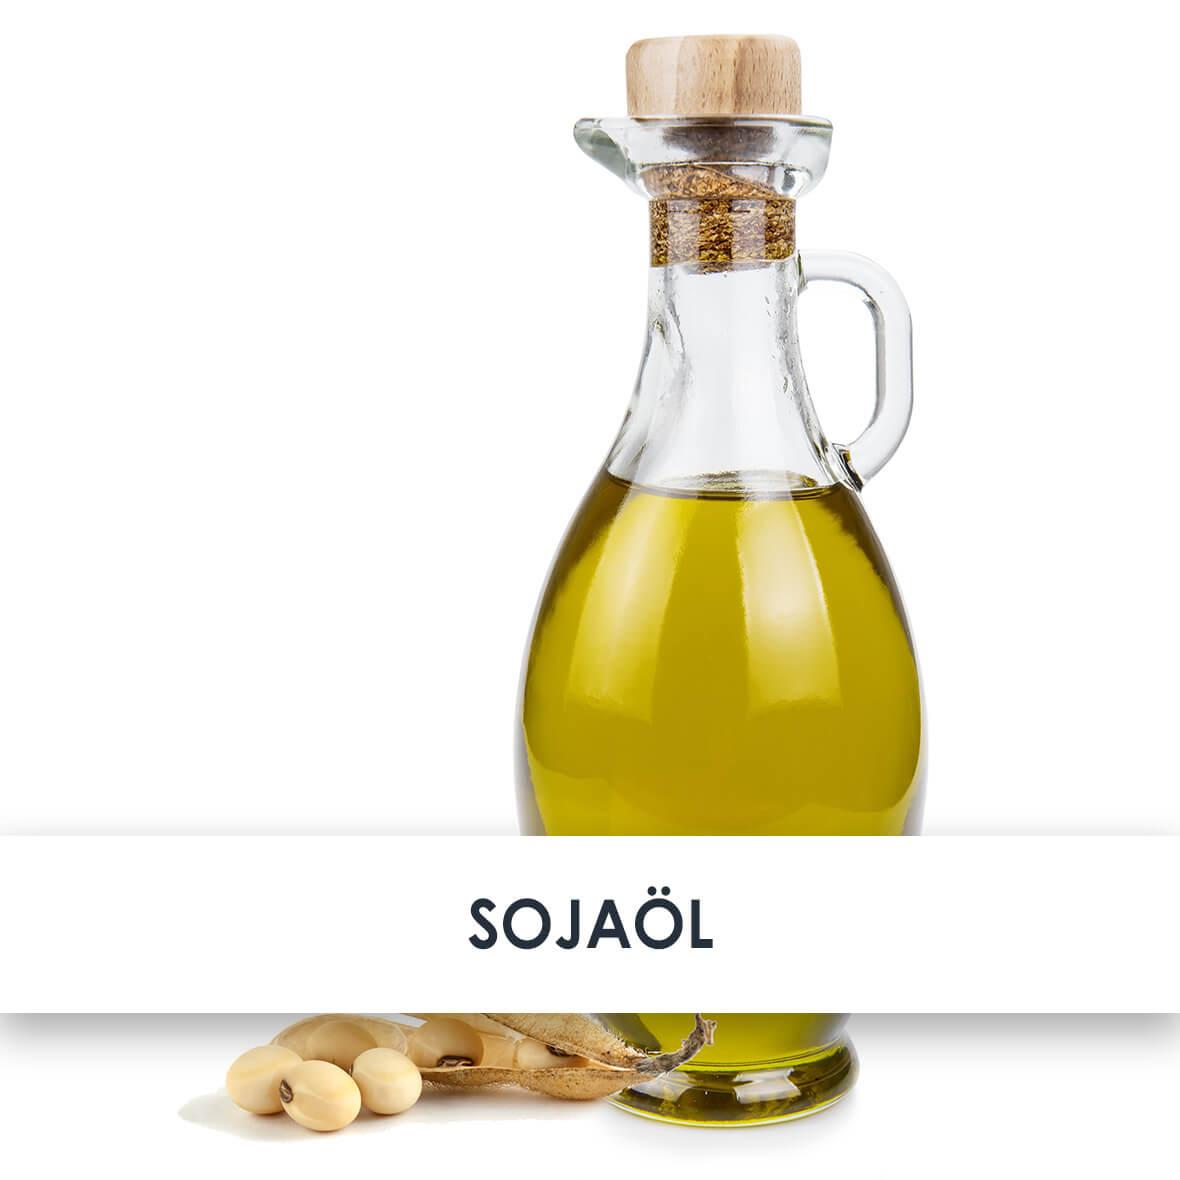 Wirkstoff Sojaöl